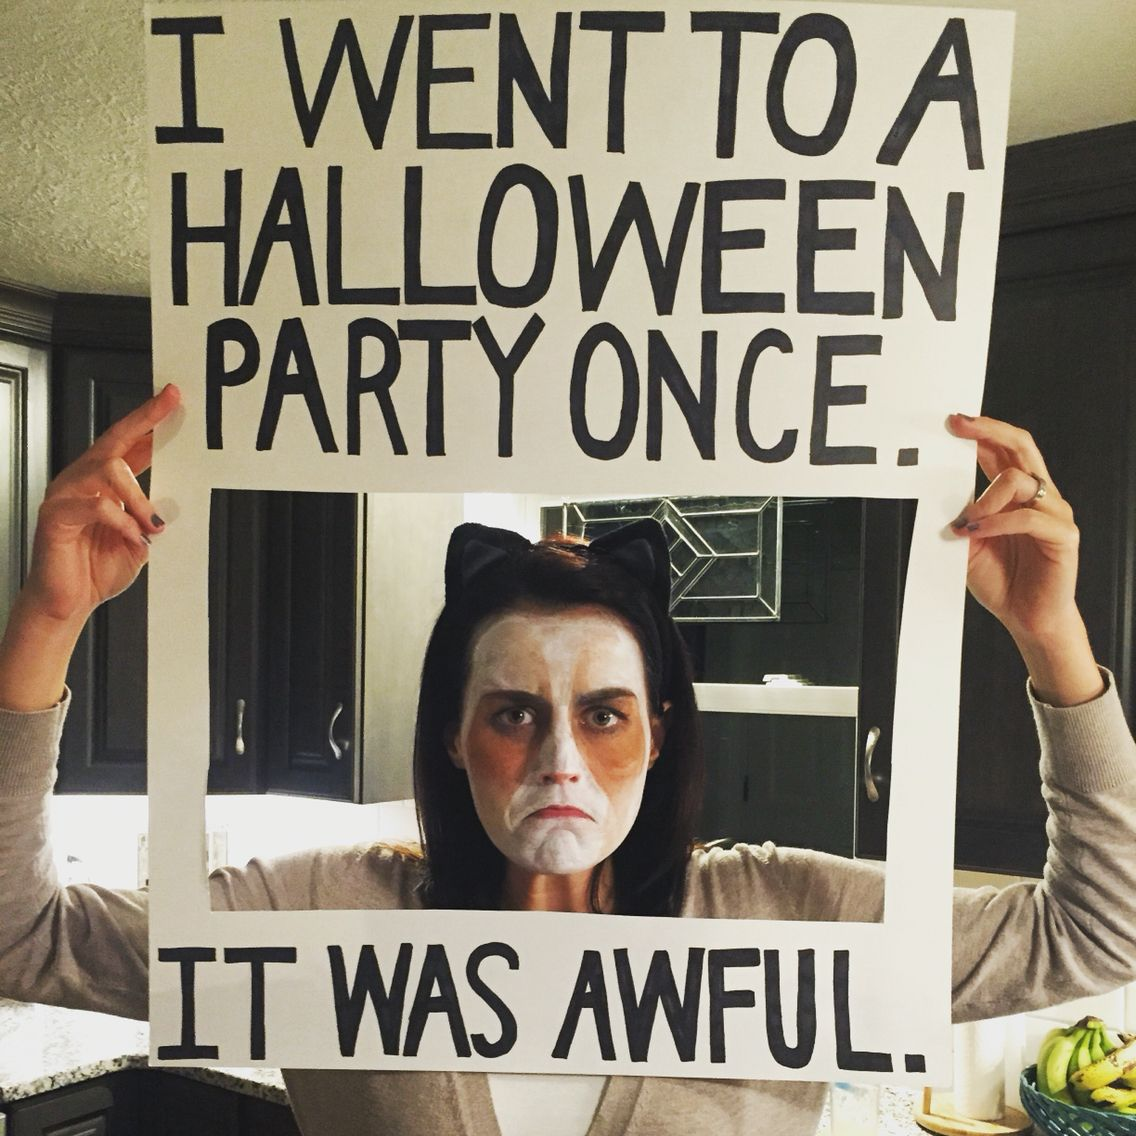 7f4b714dff44f3fcedce5ed2c8a123c7 grumpy cat halloween costume diy last minute costume meme